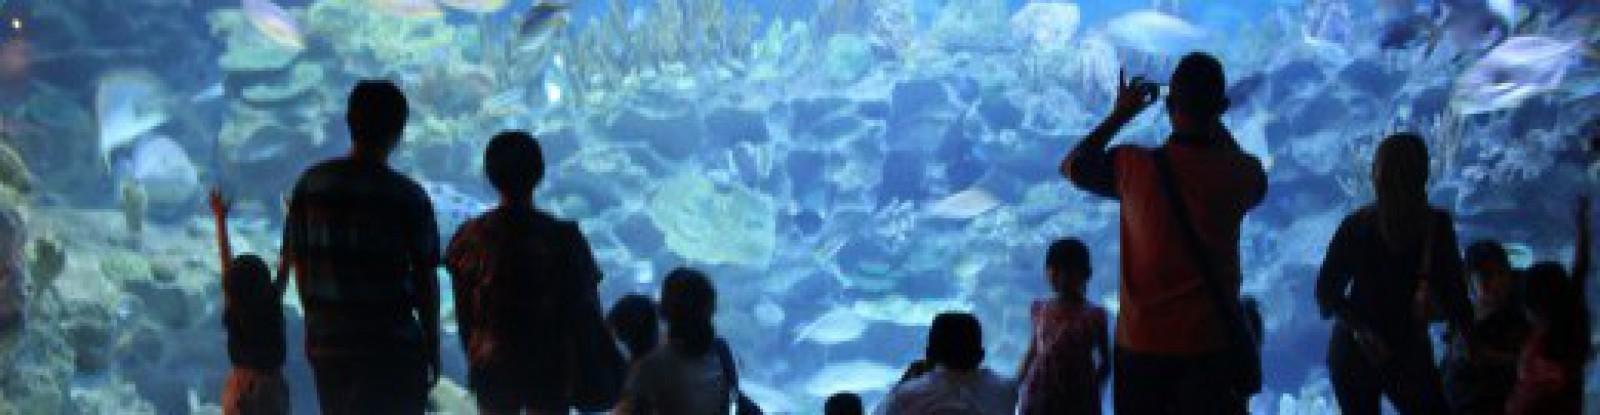 Living With Aquariums